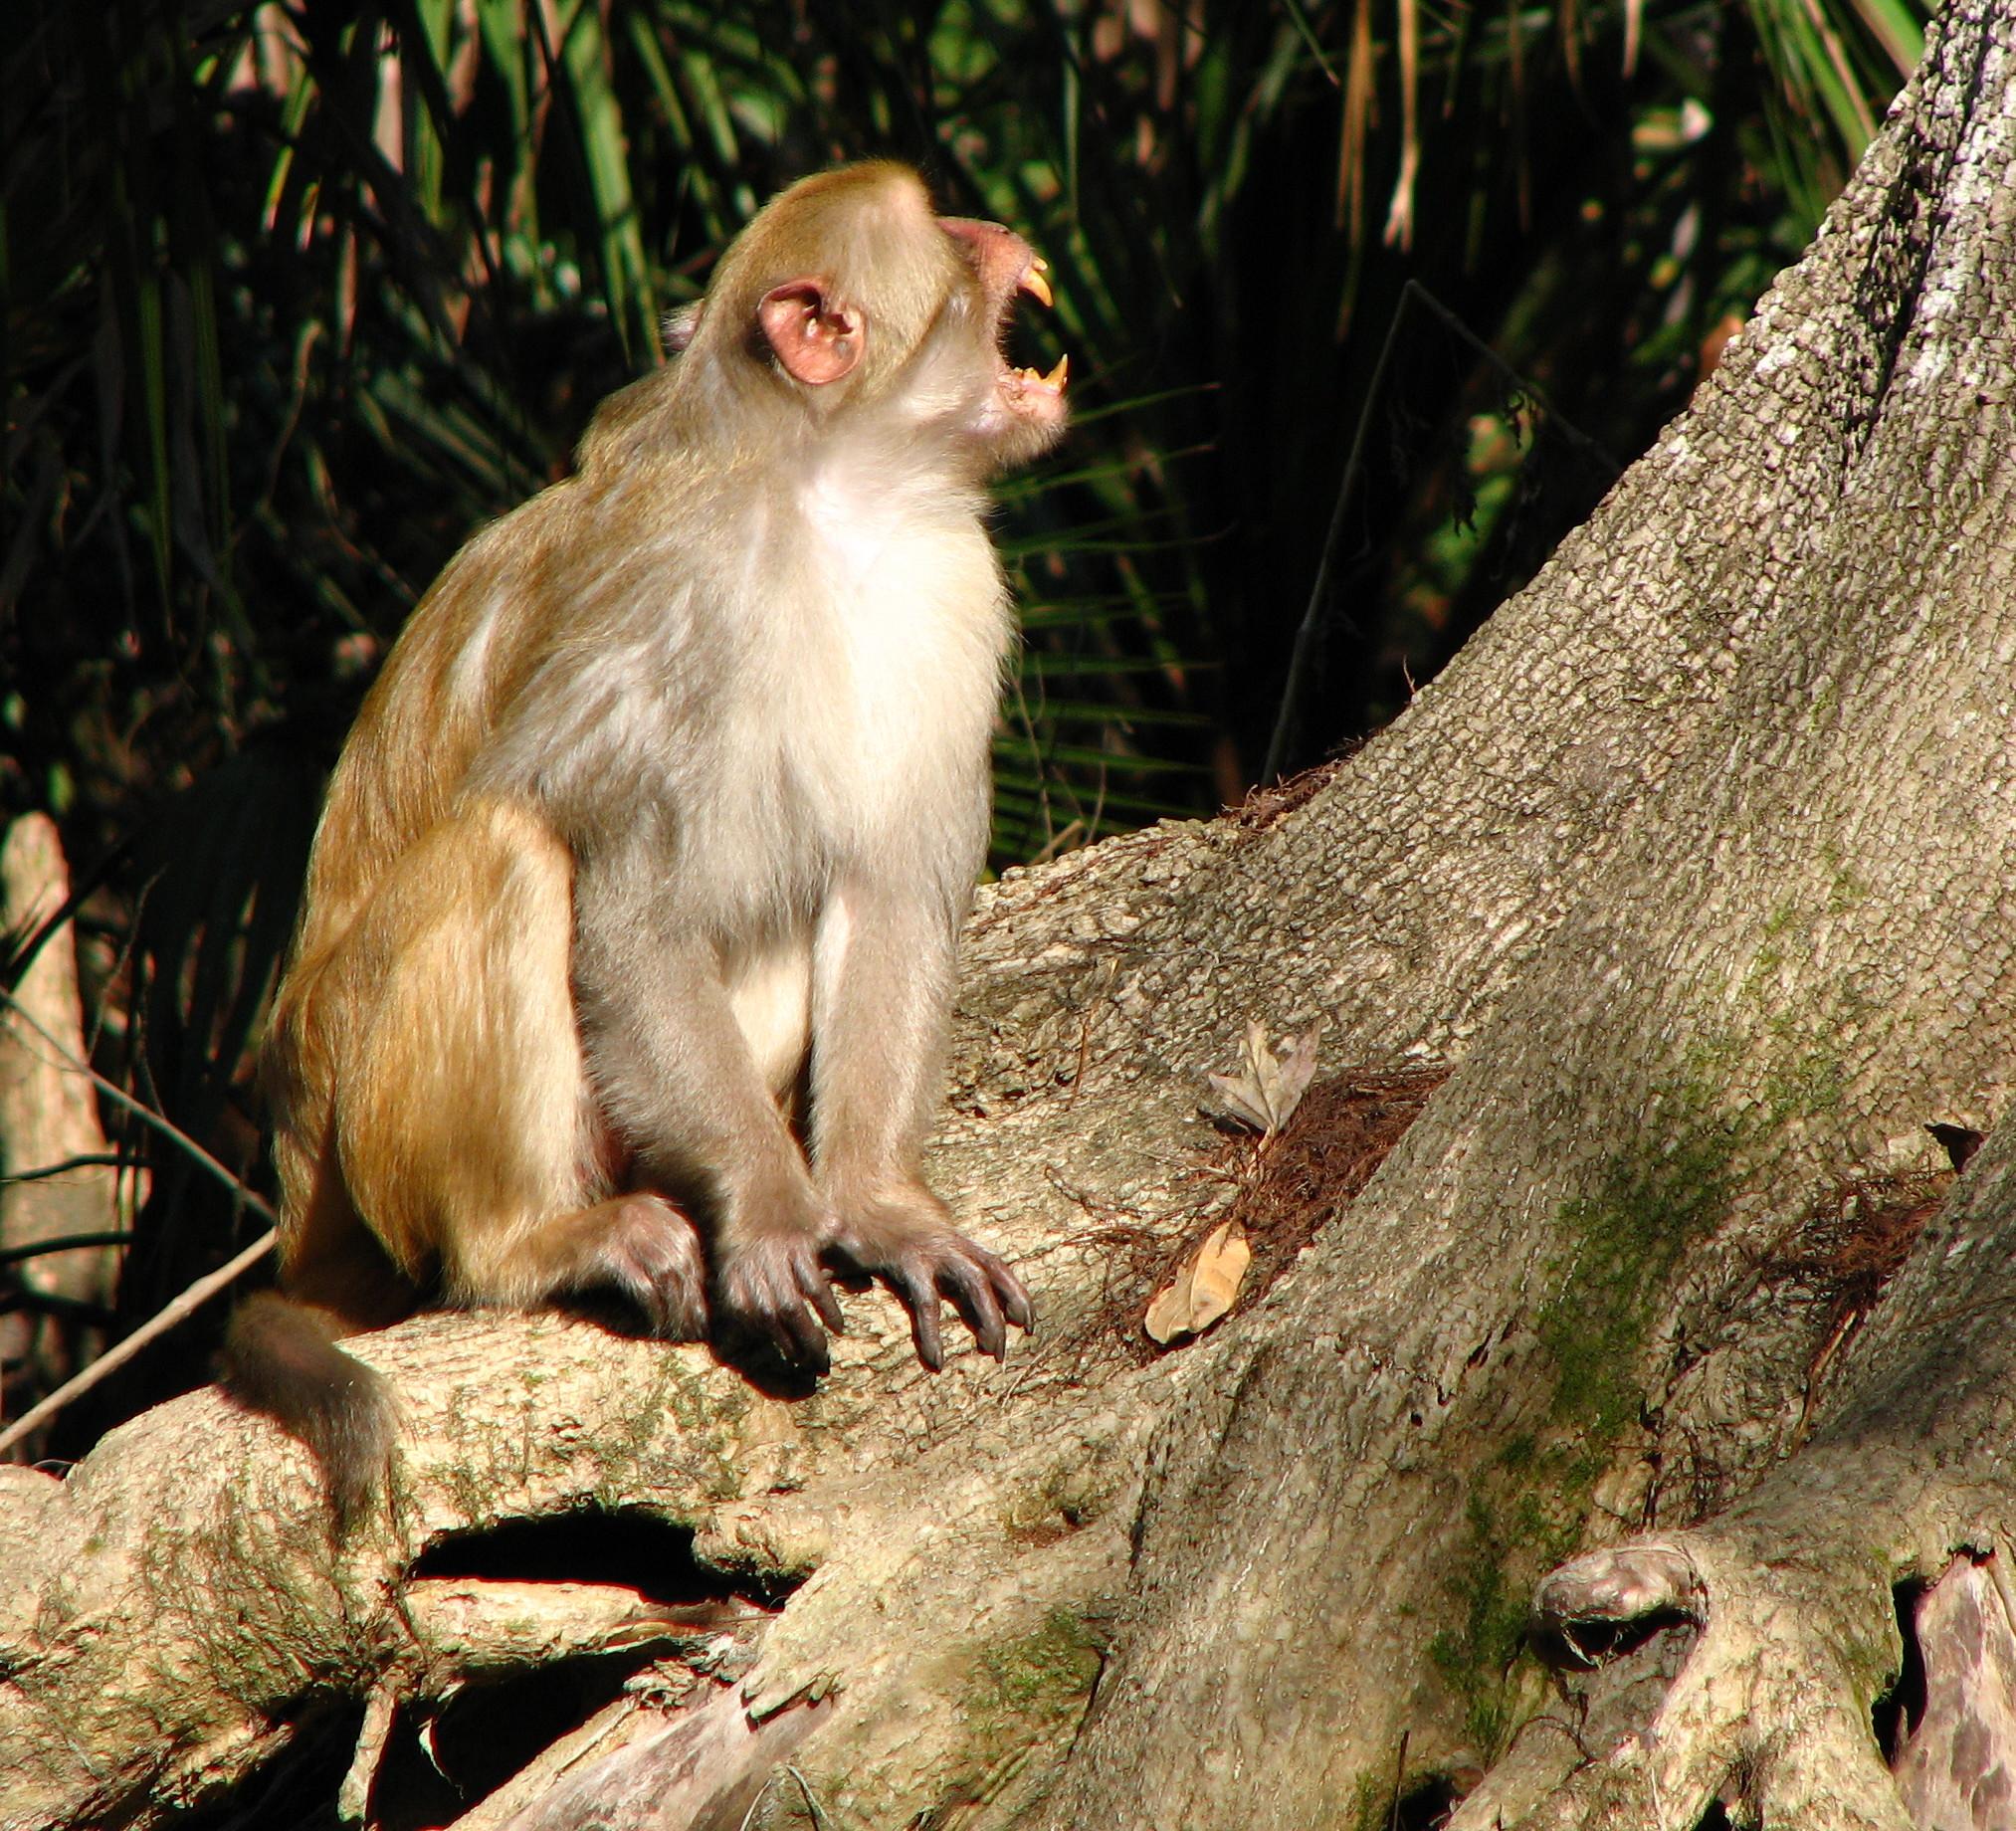 rheesus monkey, ocala national forest, monkey, florida